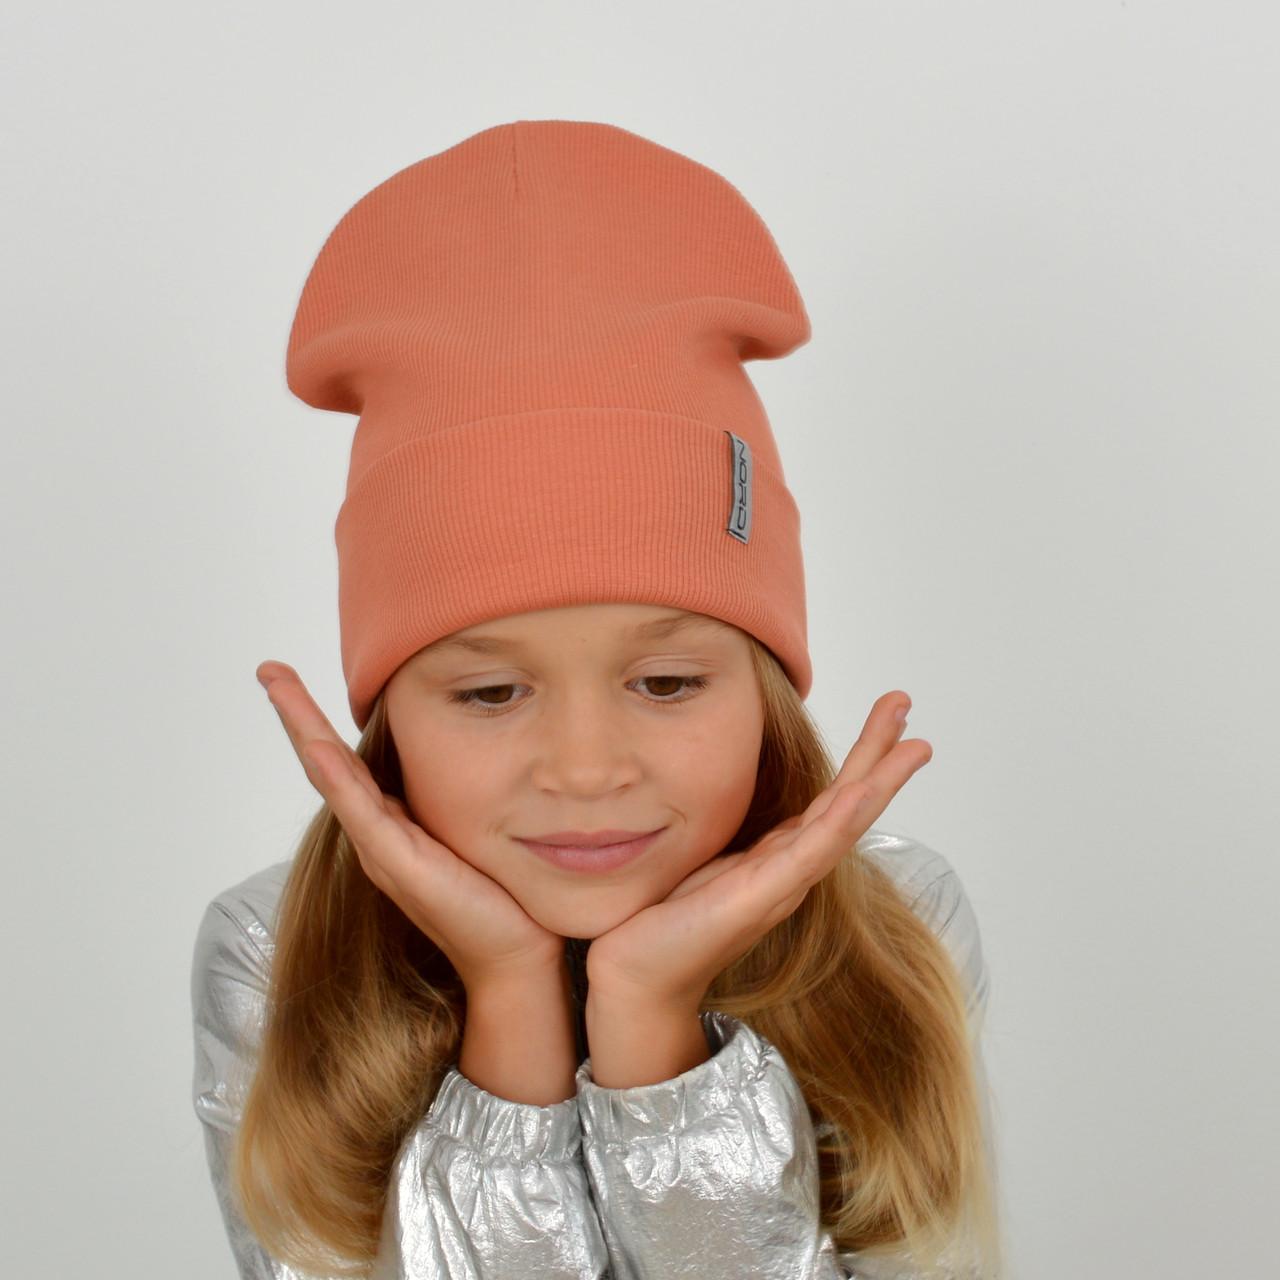 Шапка хлопковая Nord (флажок)  Персик